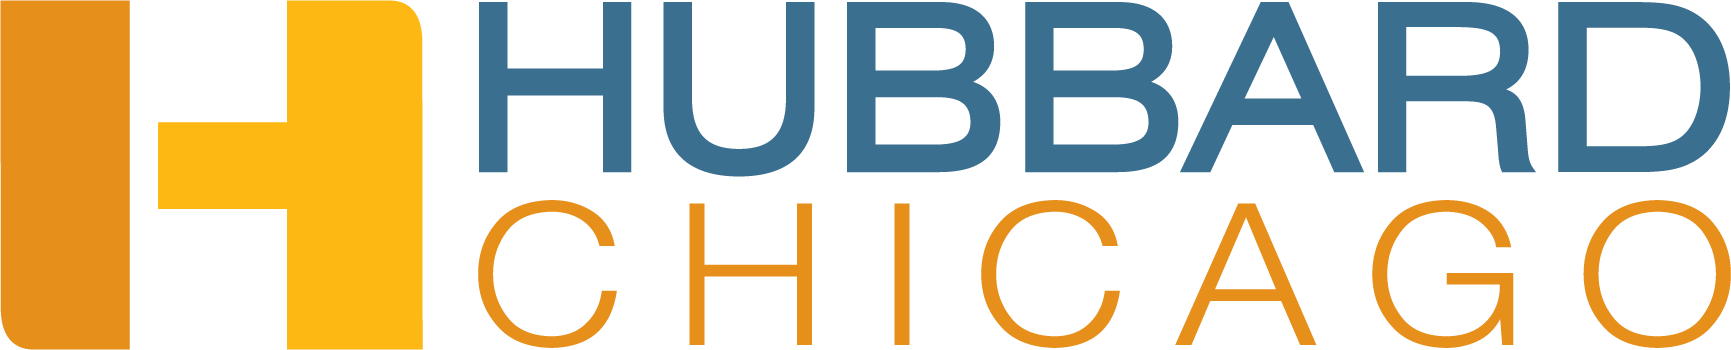 HUBBARD_Chicago_logo.png